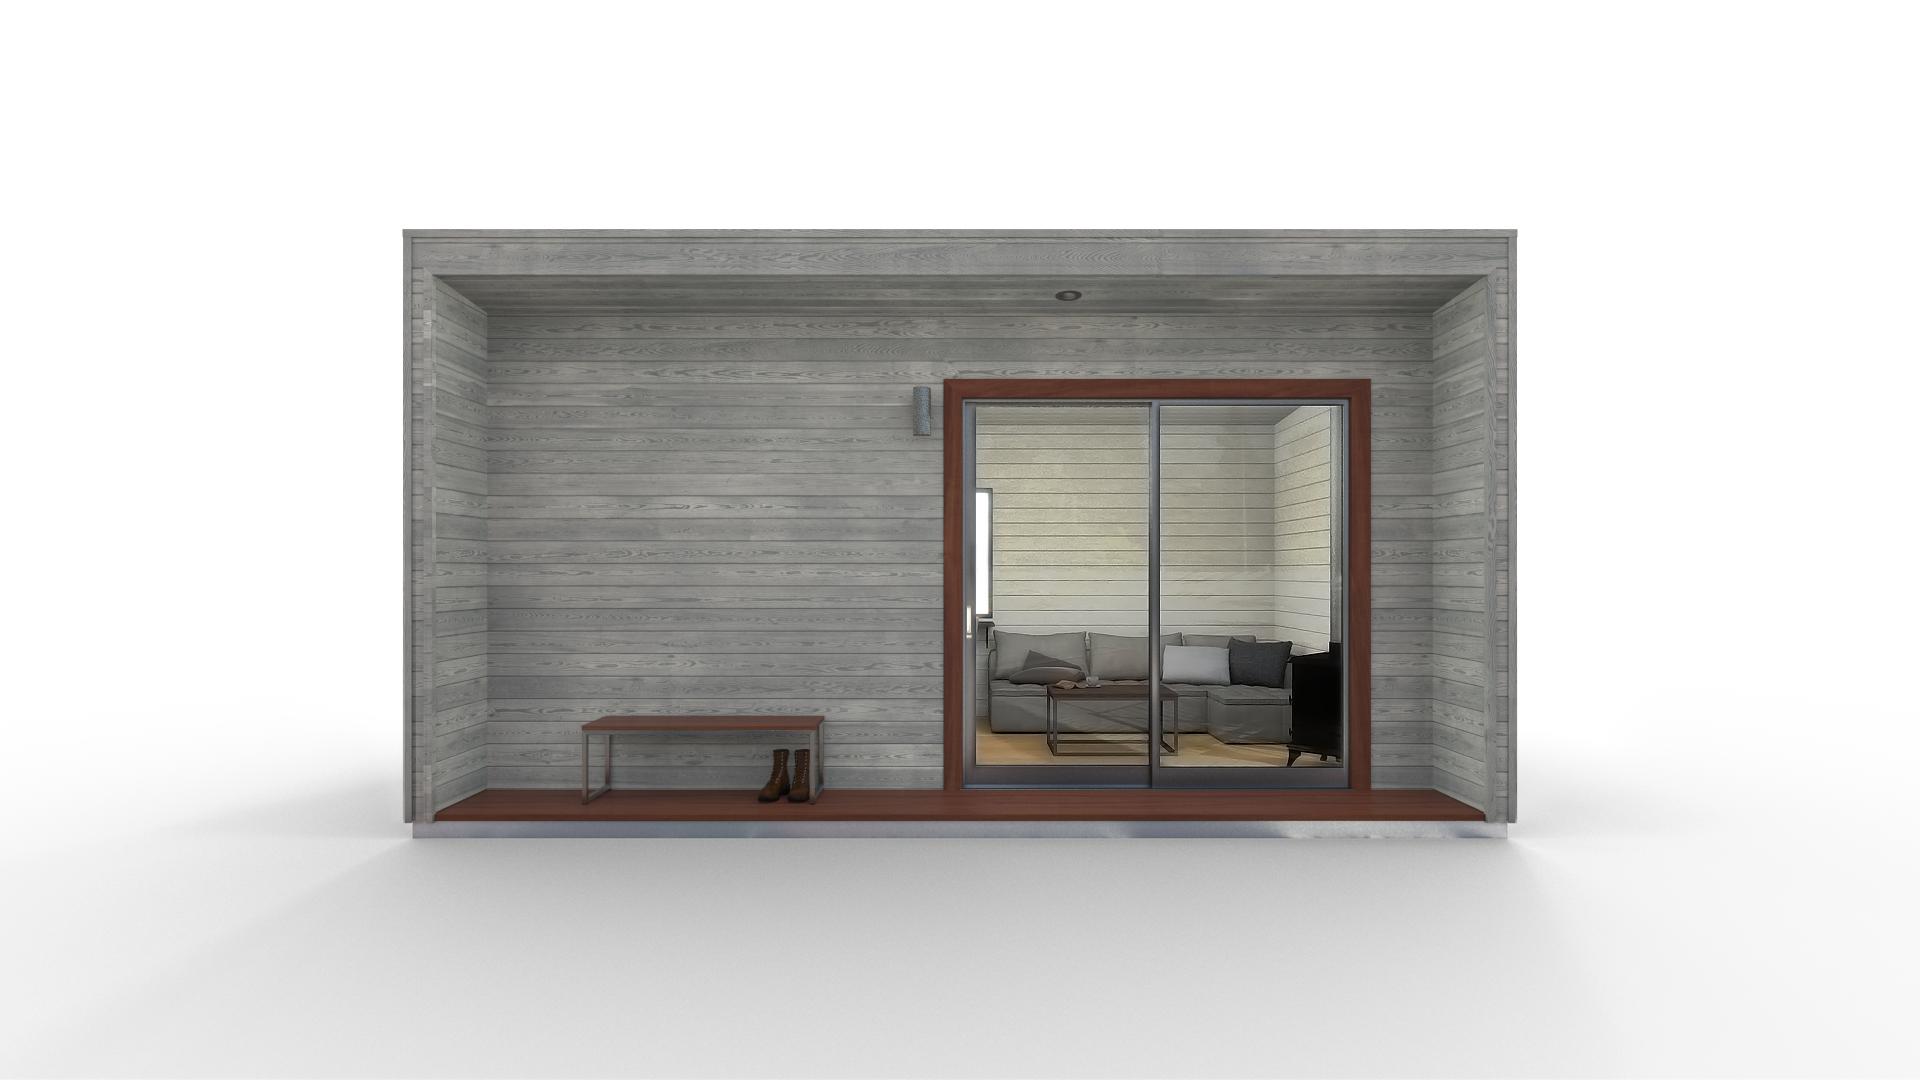 Cubist Cabin